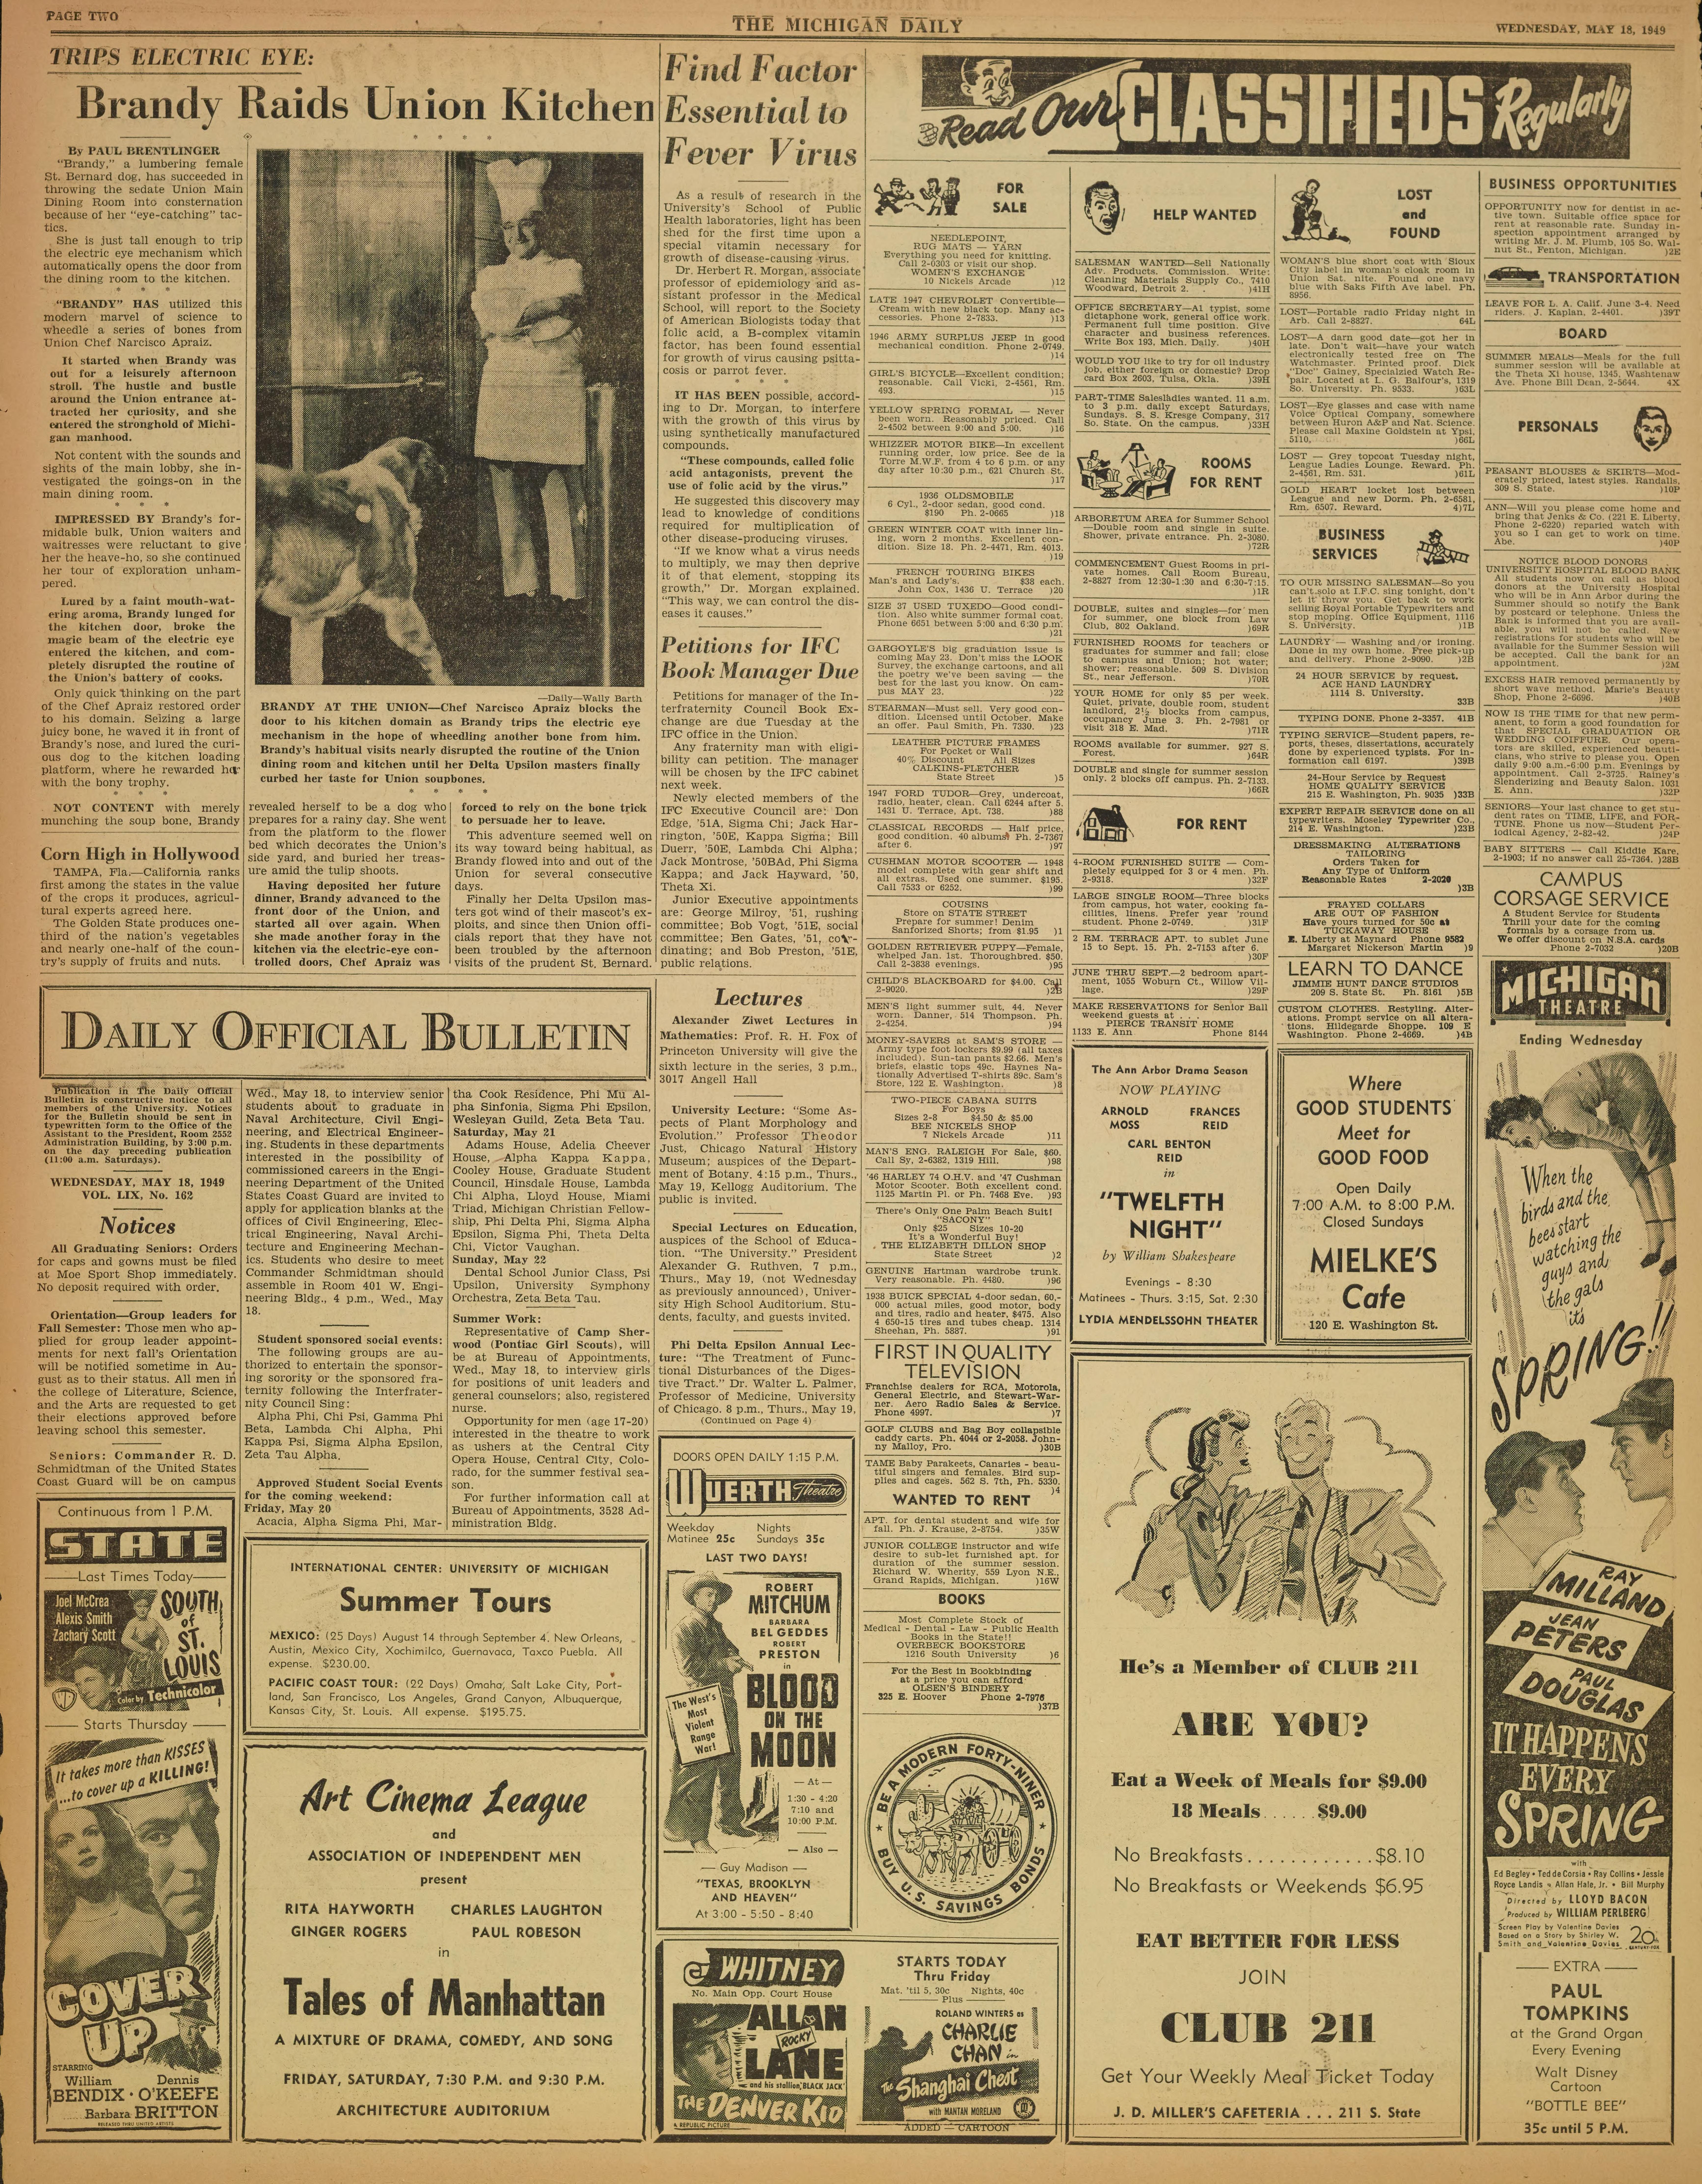 Michigan Daily Digital Archives - May 18, 1949 (vol  59, iss